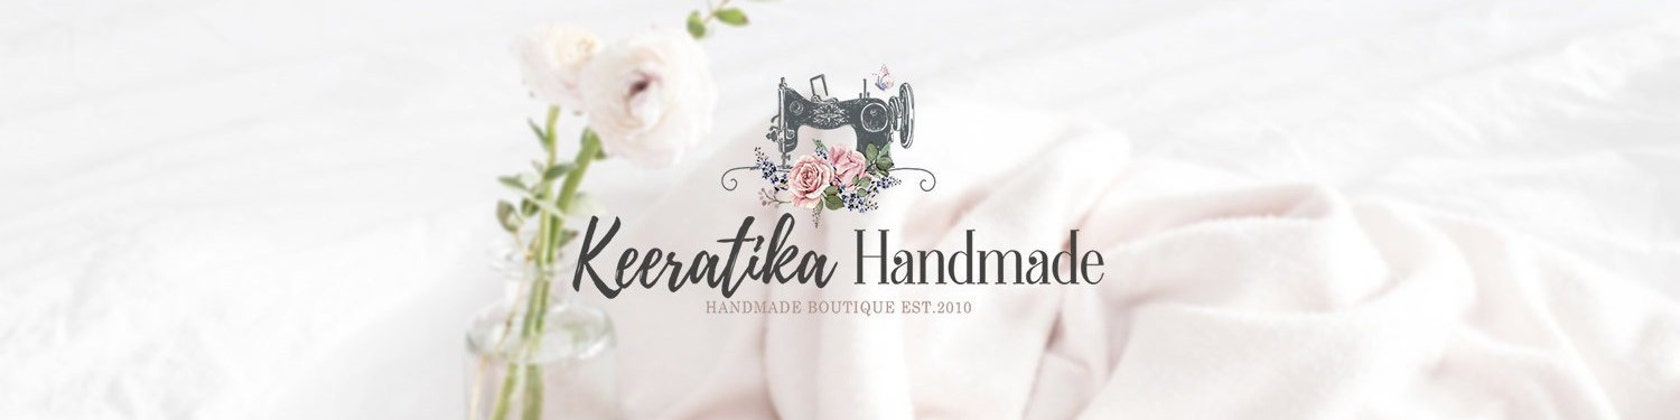 ba8cadf71f3a Luxury Well Handmade Bridesmaid Dresses by KEERATIKA on Etsy